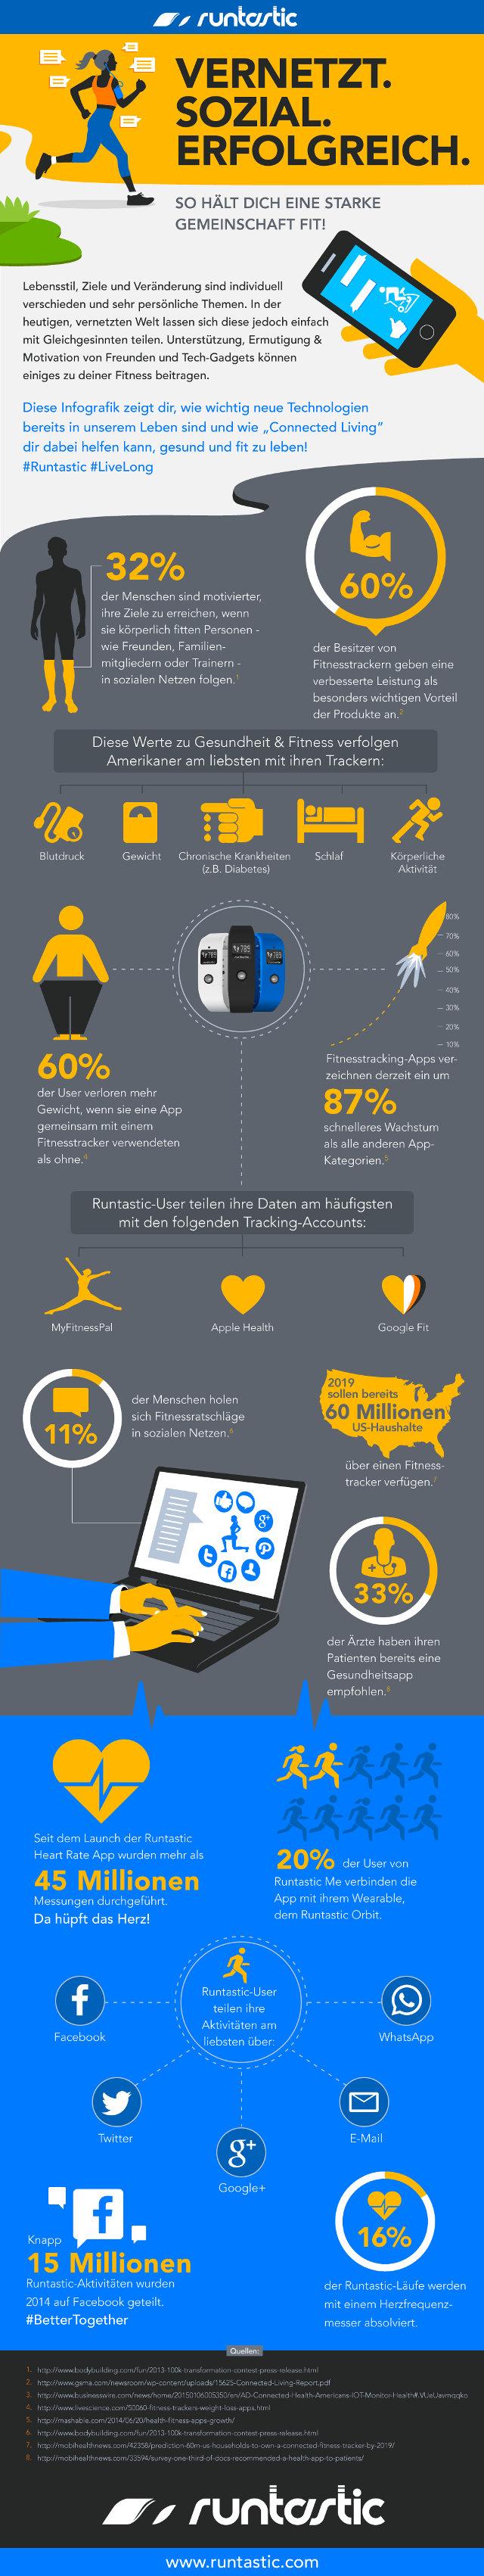 runtastic infografik sozial vernetzt erfolgreich